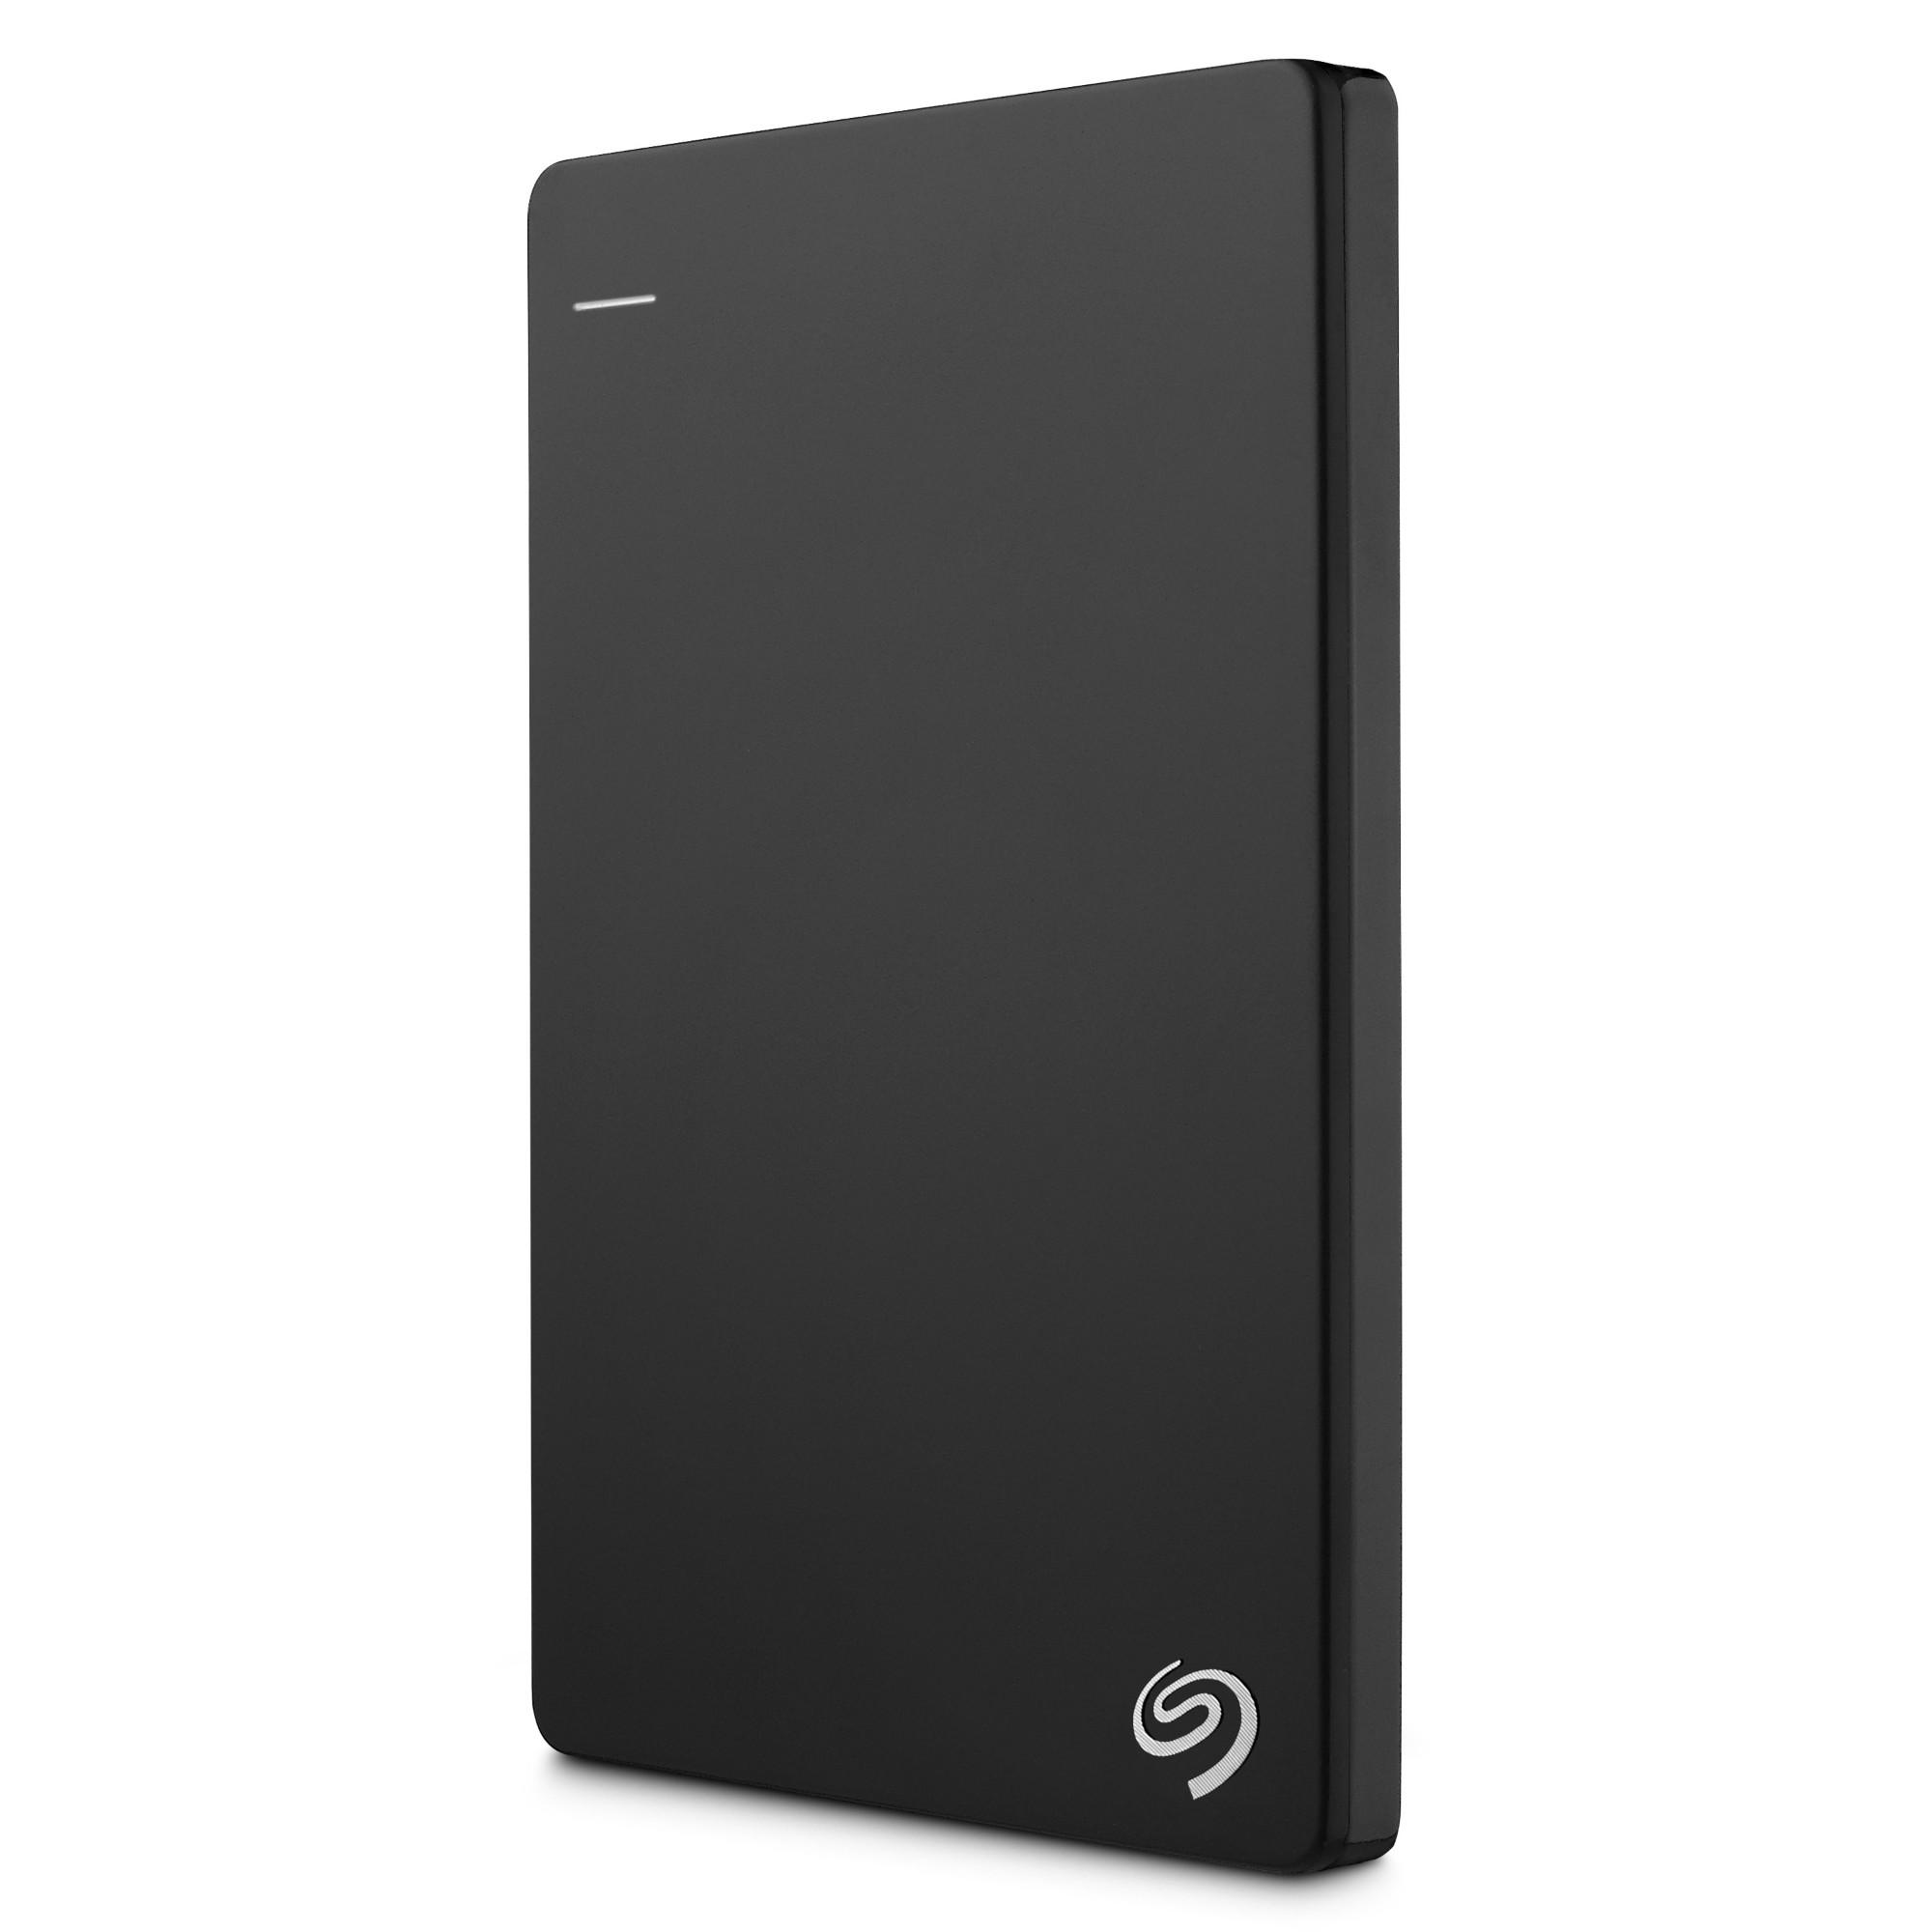 Seagate Backup Plus Slim, 500GB, Black